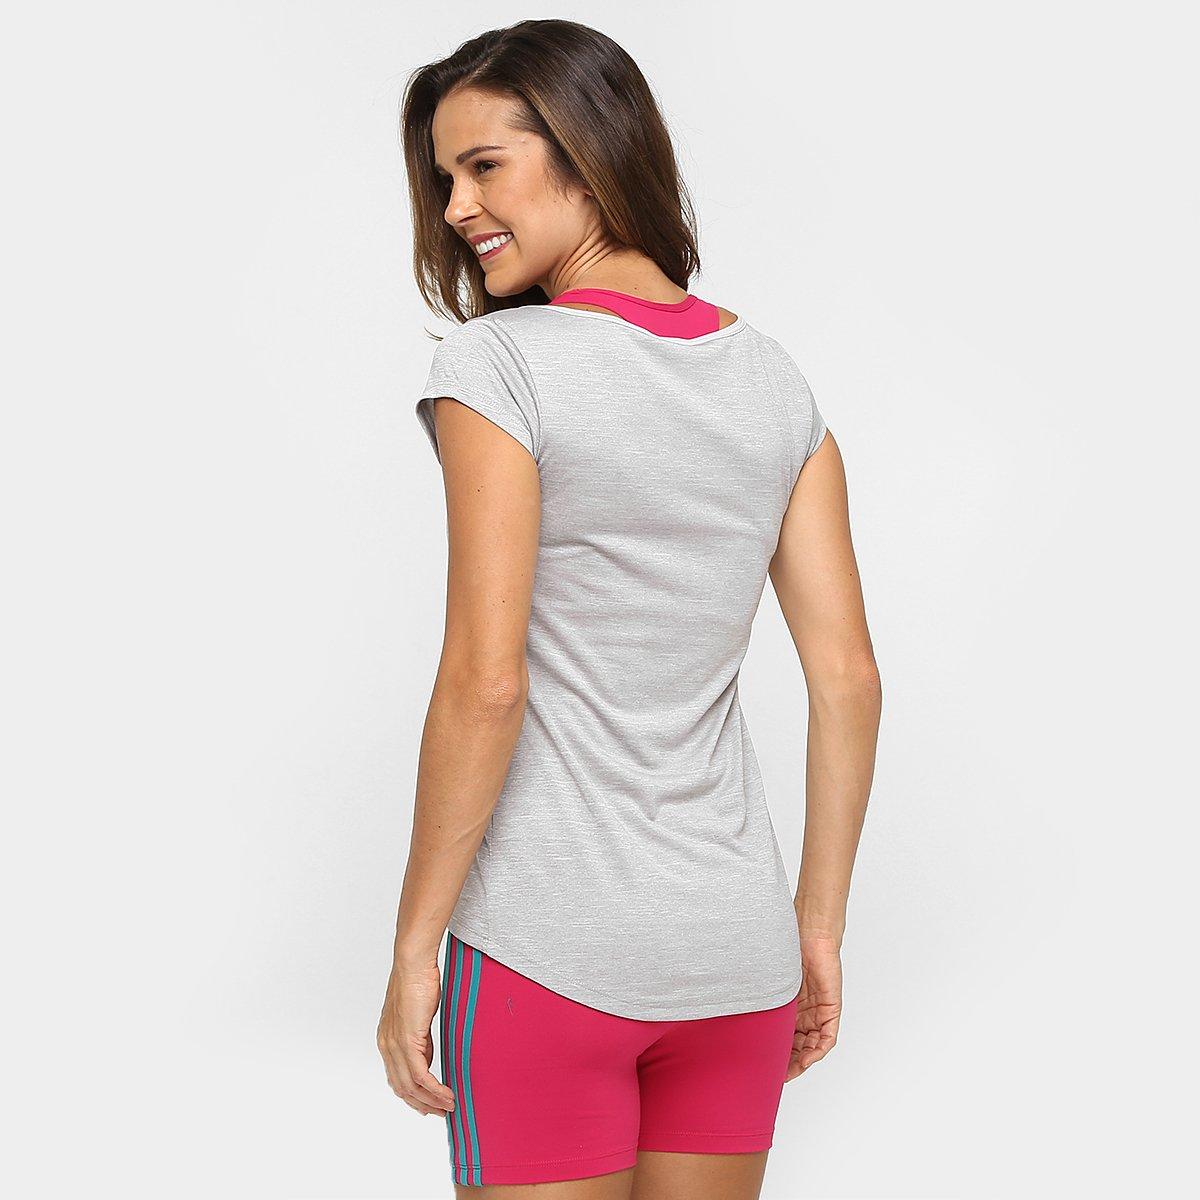 Clima Adidas Ess Adidas Mescla Ess Camiseta Cinza Camiseta Clima Feminina gqwx5U4wC